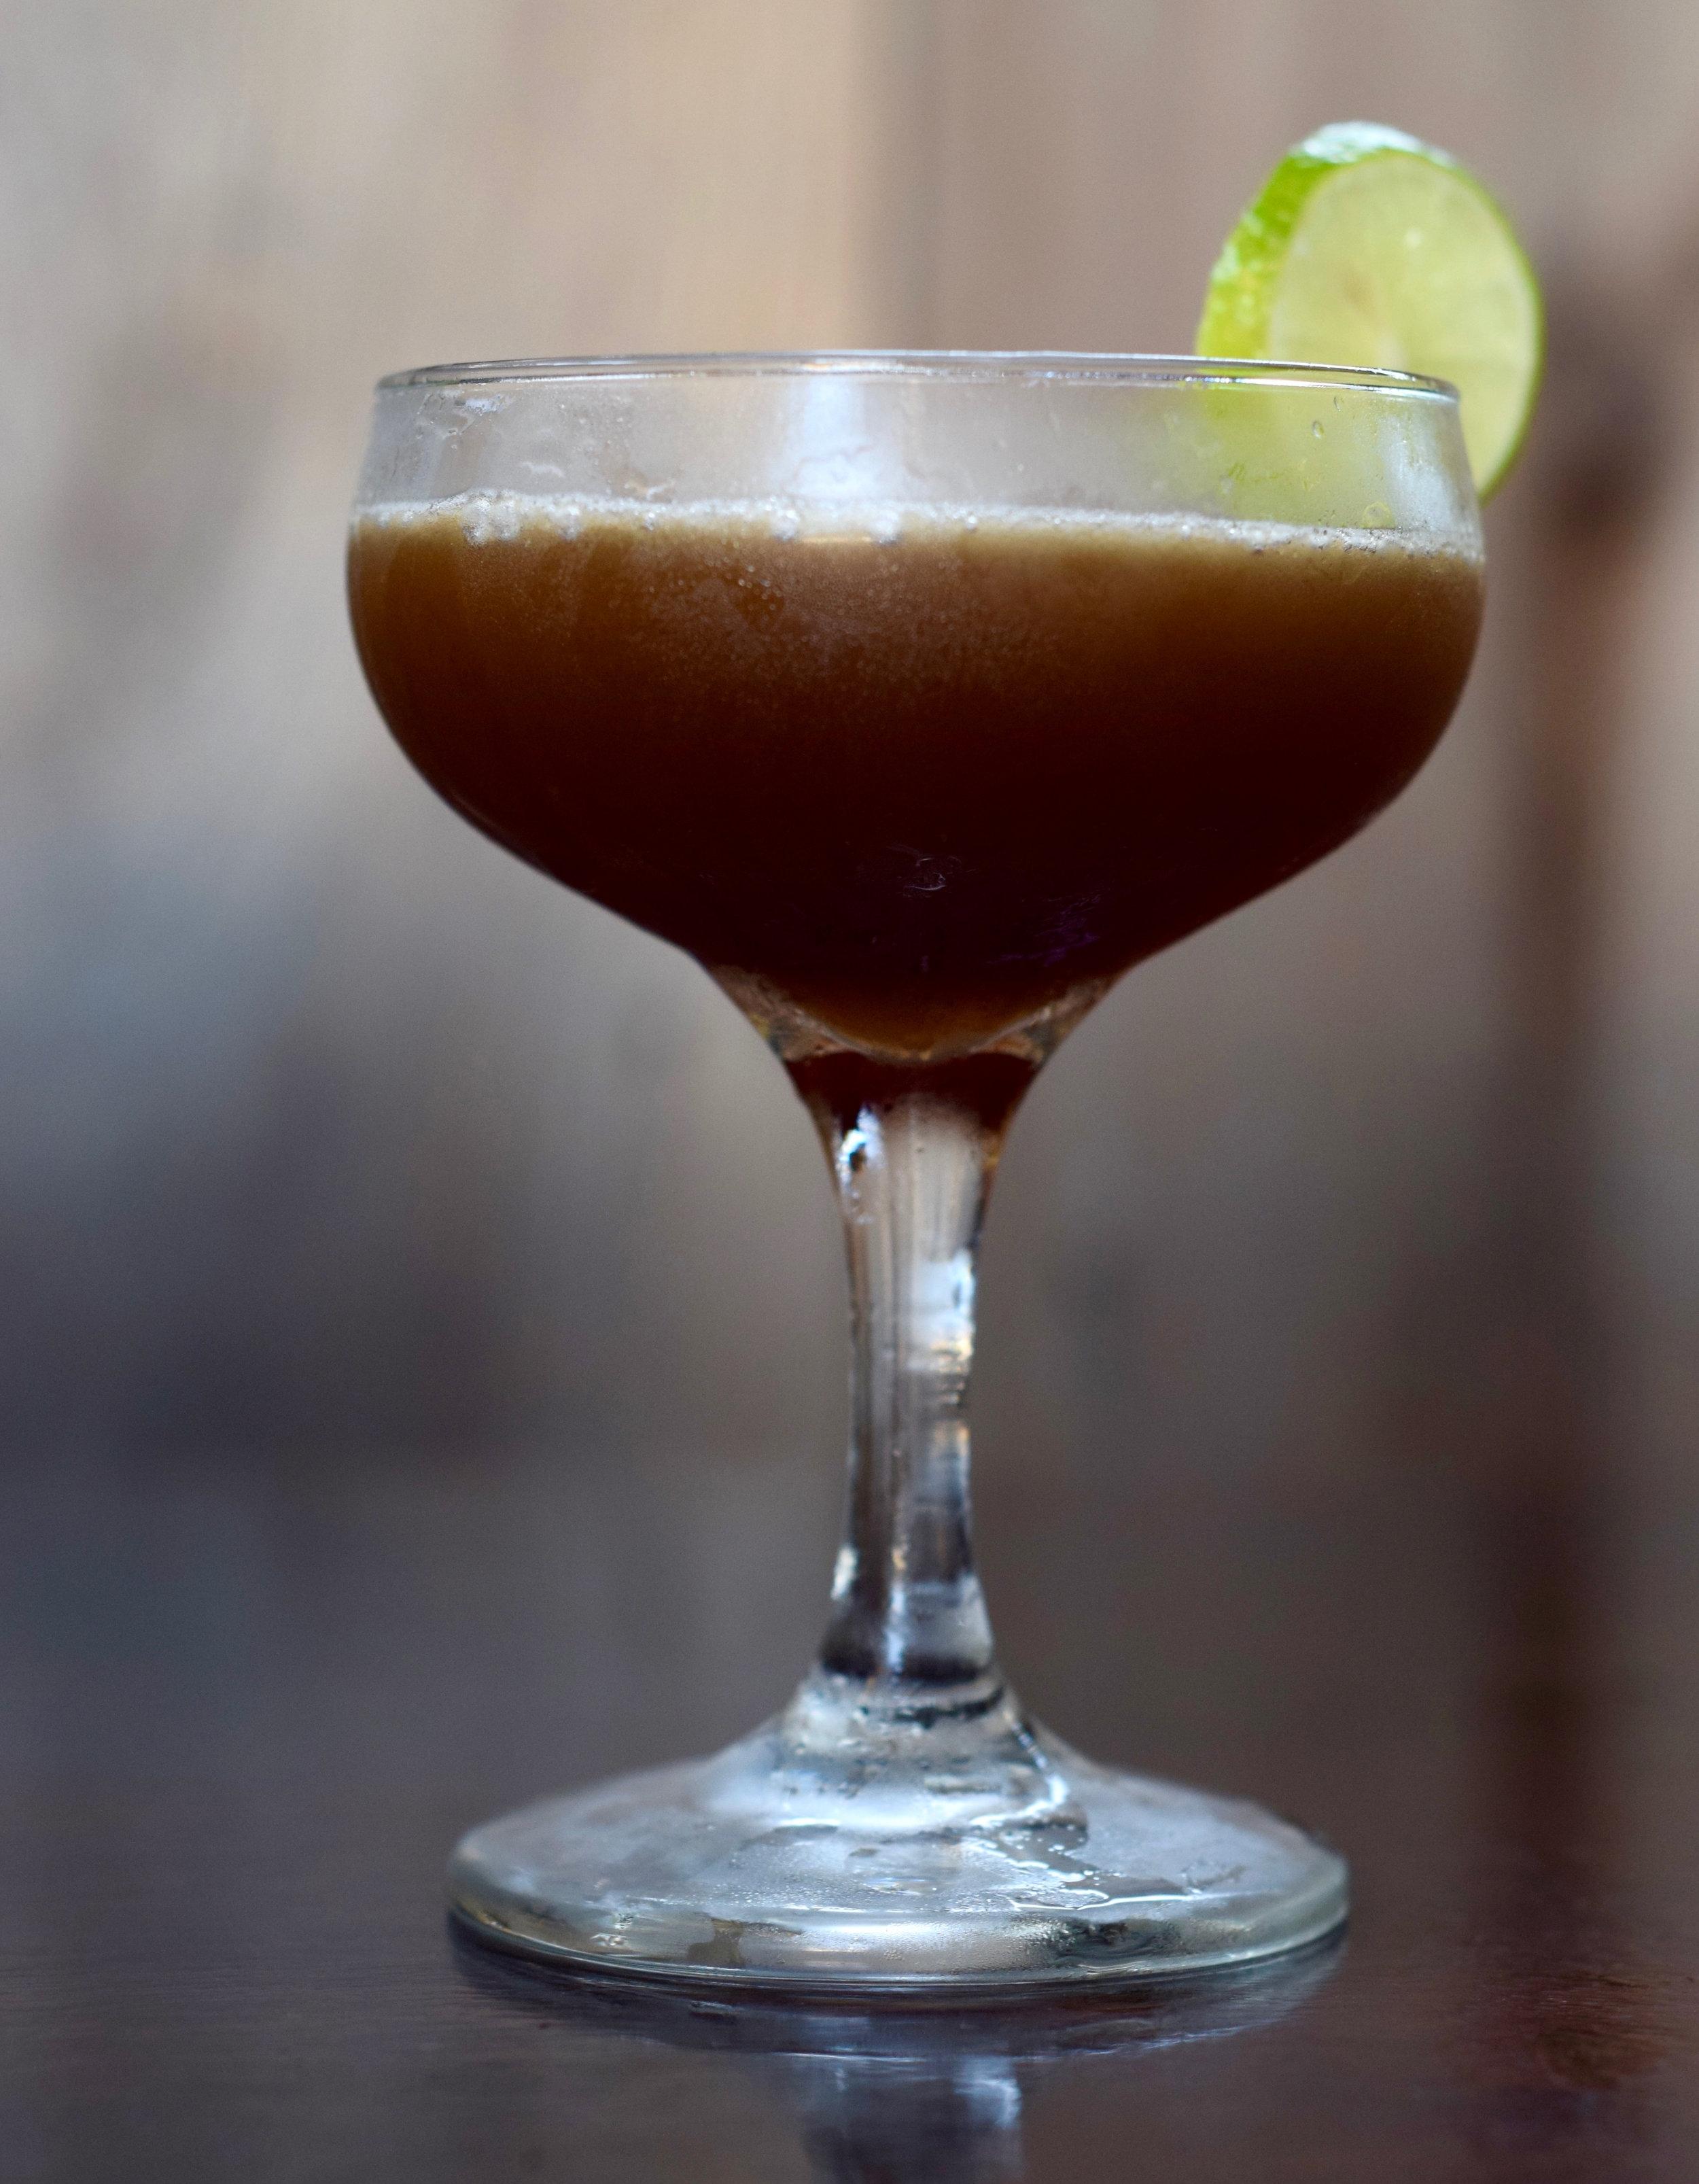 BLACK MAGIC WOMAN - 1 oz blackstrap rum1 oz dark rum1/2 oz nostrum grapefruit piloncillo chipotle shrub3/4 oz fresh lime juice1/4 oz ginger syrup2 dashes angostura bittersShake with ice and strain.